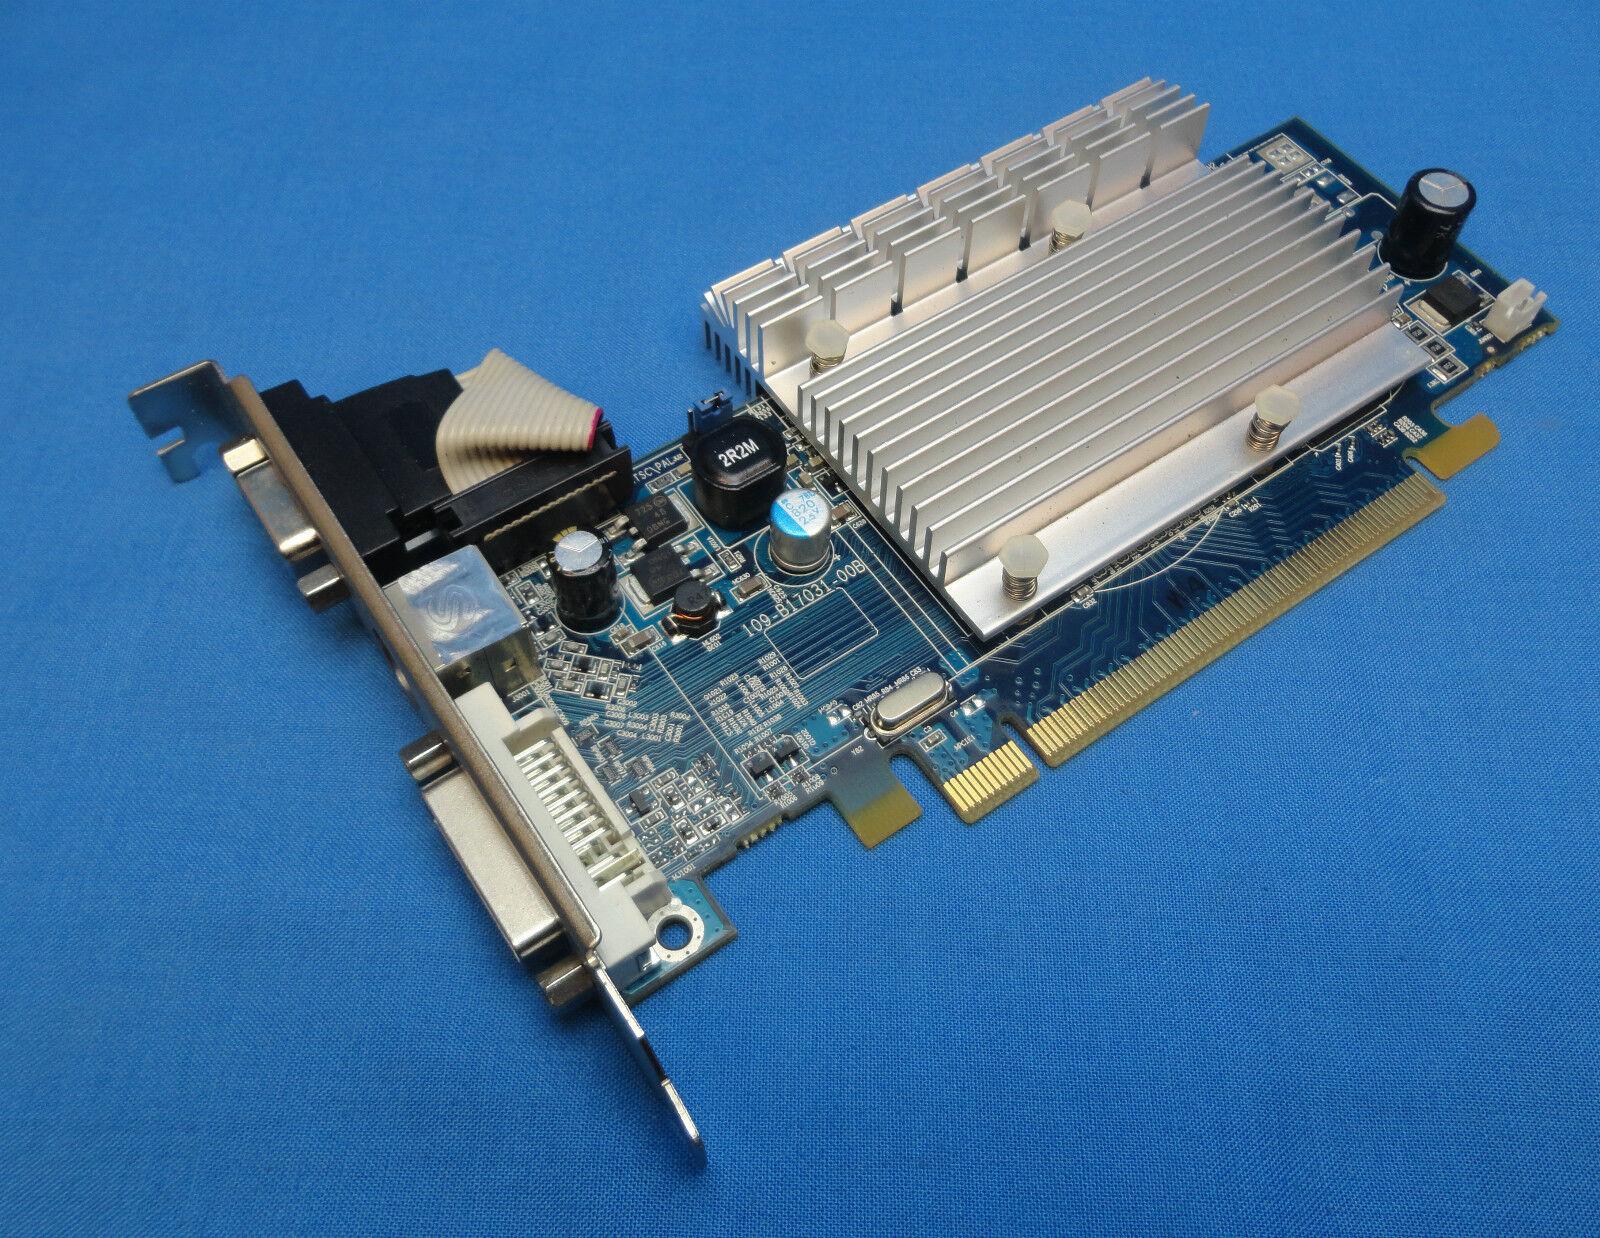 Sapphire HD2400 PRO 188-04E40-0H2SA 256MB PCI-E Graphics Card with DVI/VGA